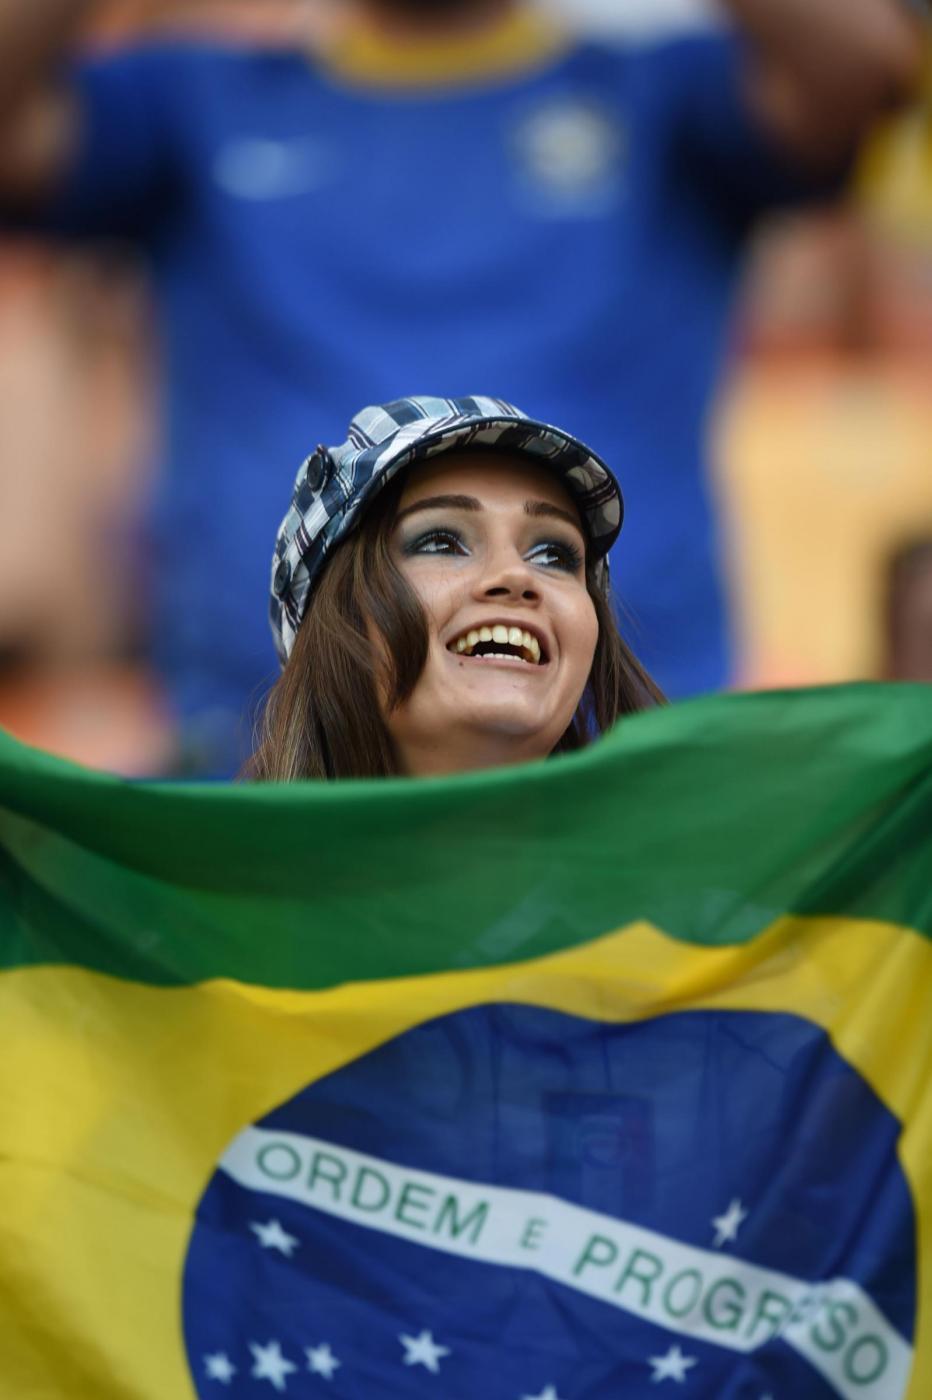 Mondiali 2014 inghilterra vs italia fase a gironi for Nuovo stile coloniale in inghilterra